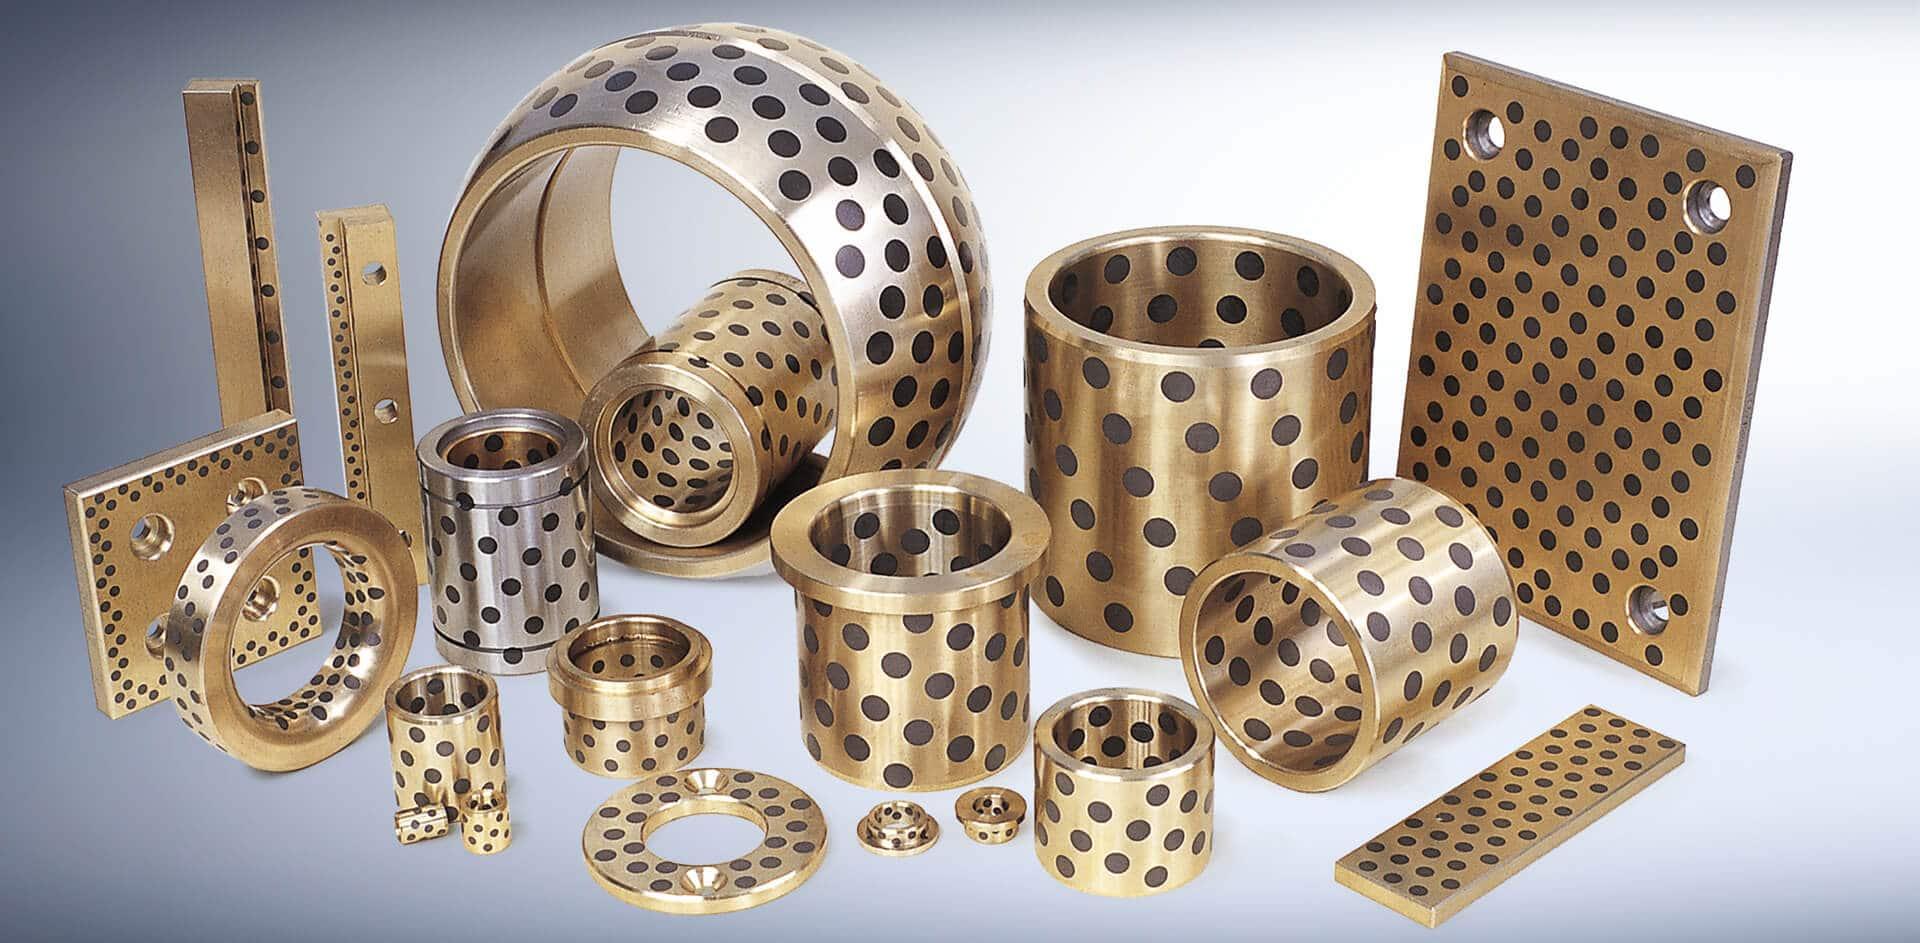 Oilless wear plate guide bushing self-lubricating bearings graphite